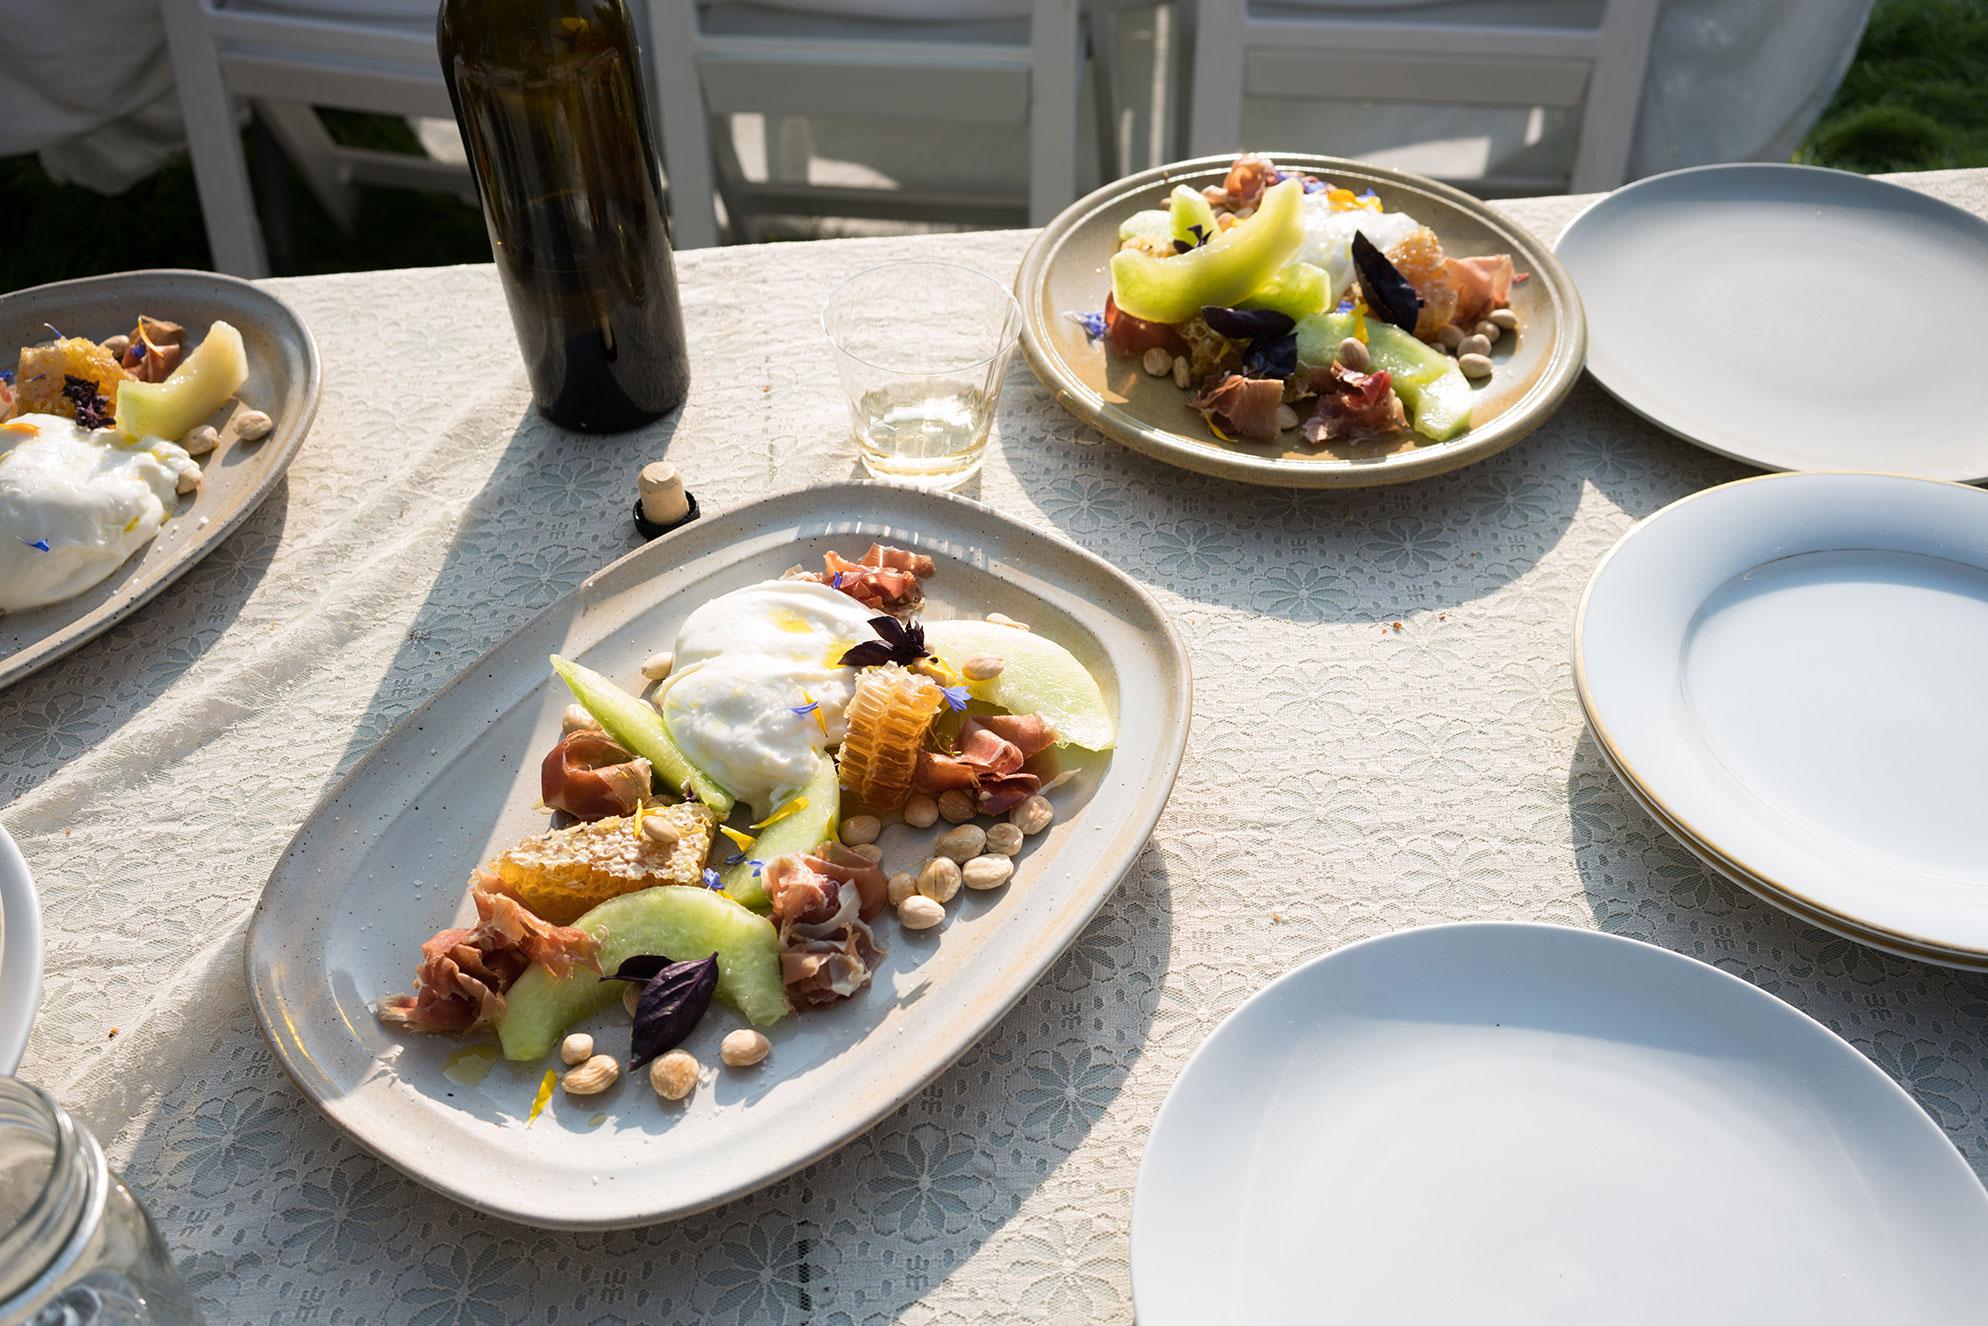 Burrata with honeycomb, melon, prosciutto and marcona almonds -